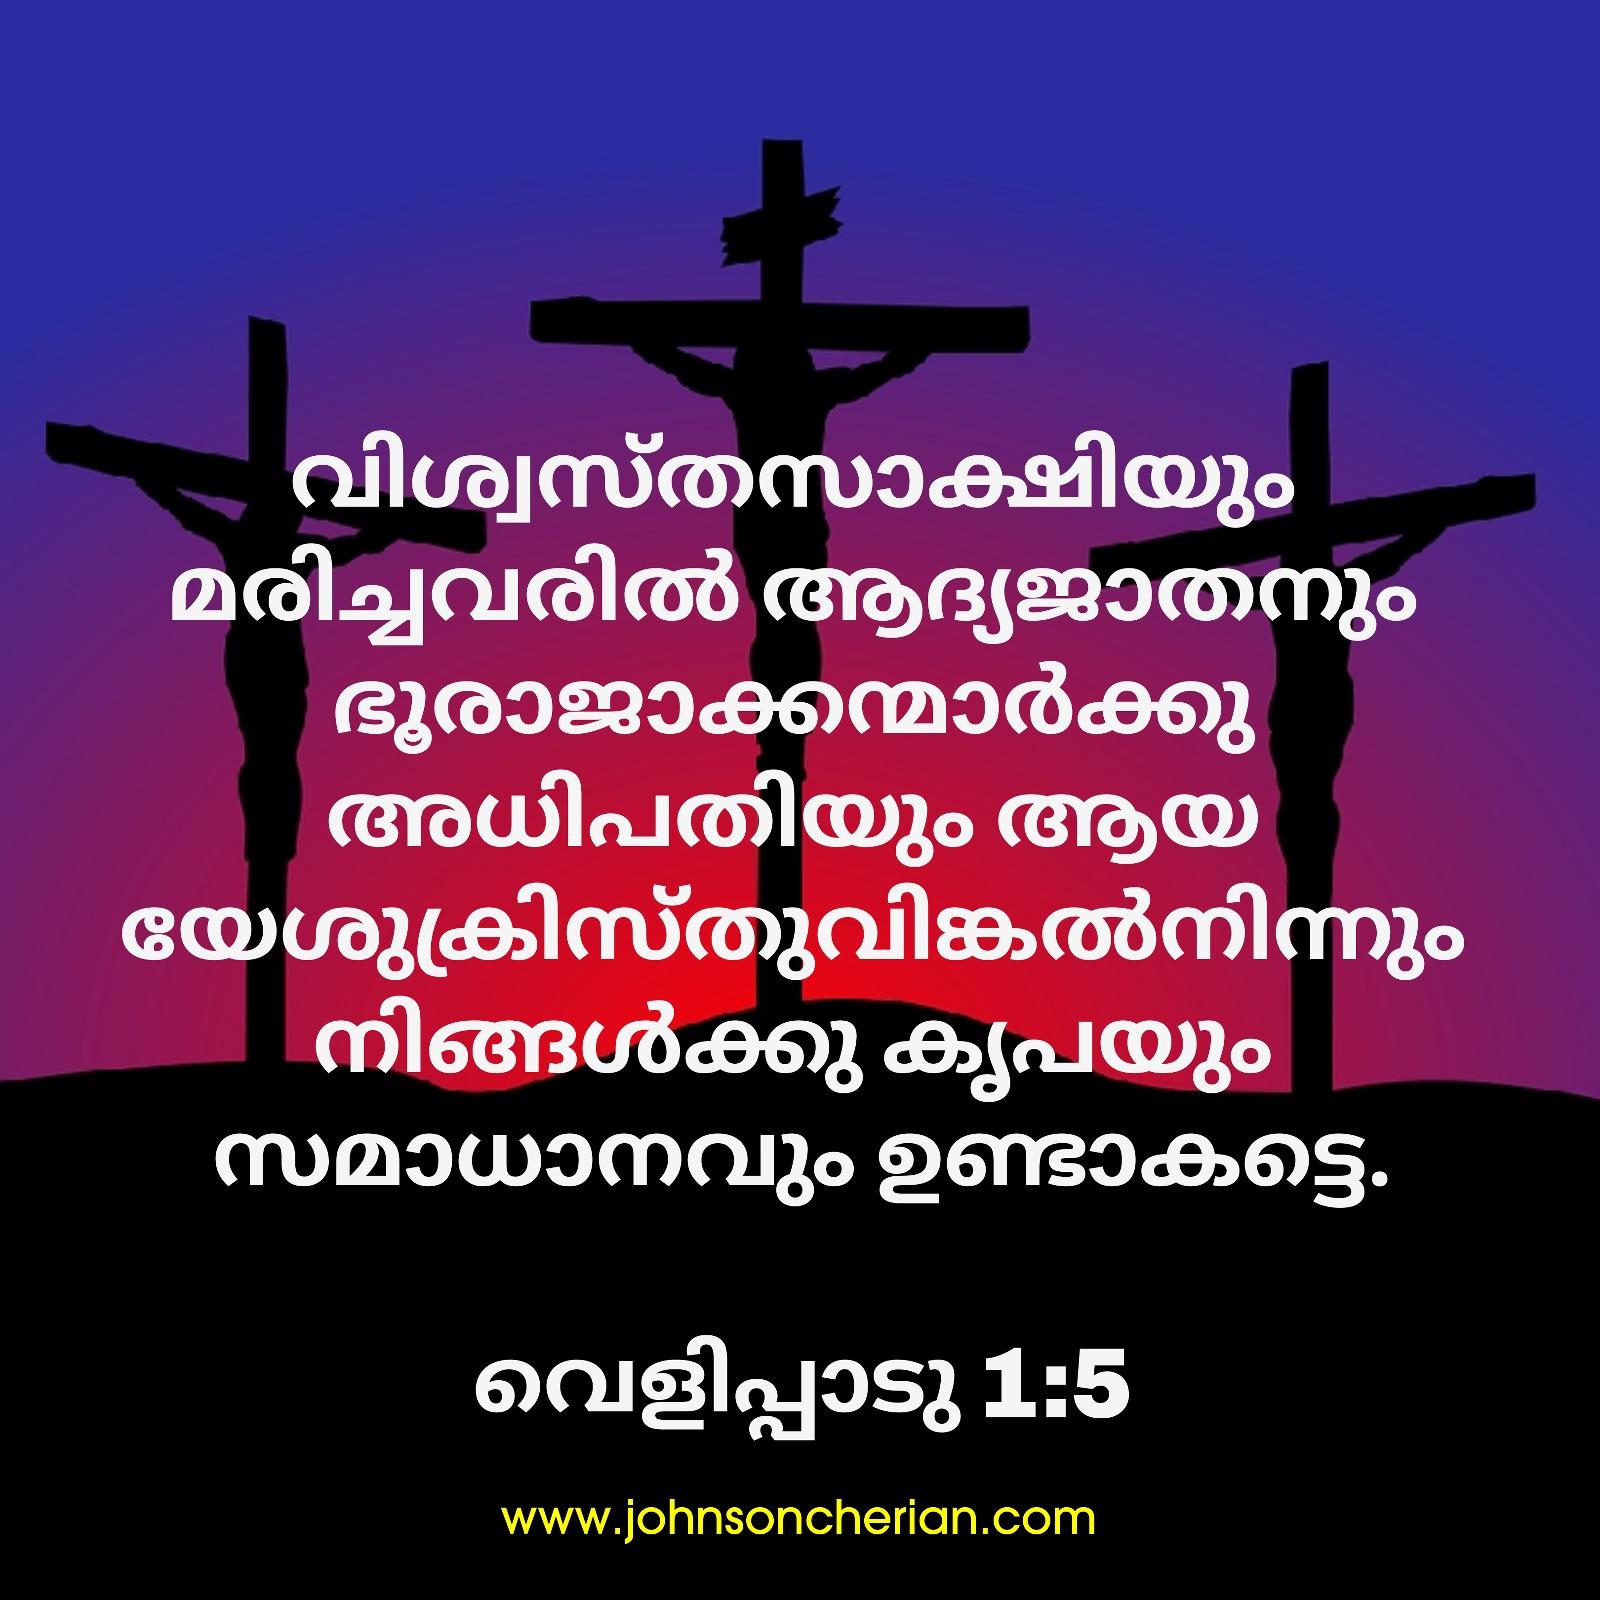 Malayalam Christian Wallpapers: Free Christian Wallpapers